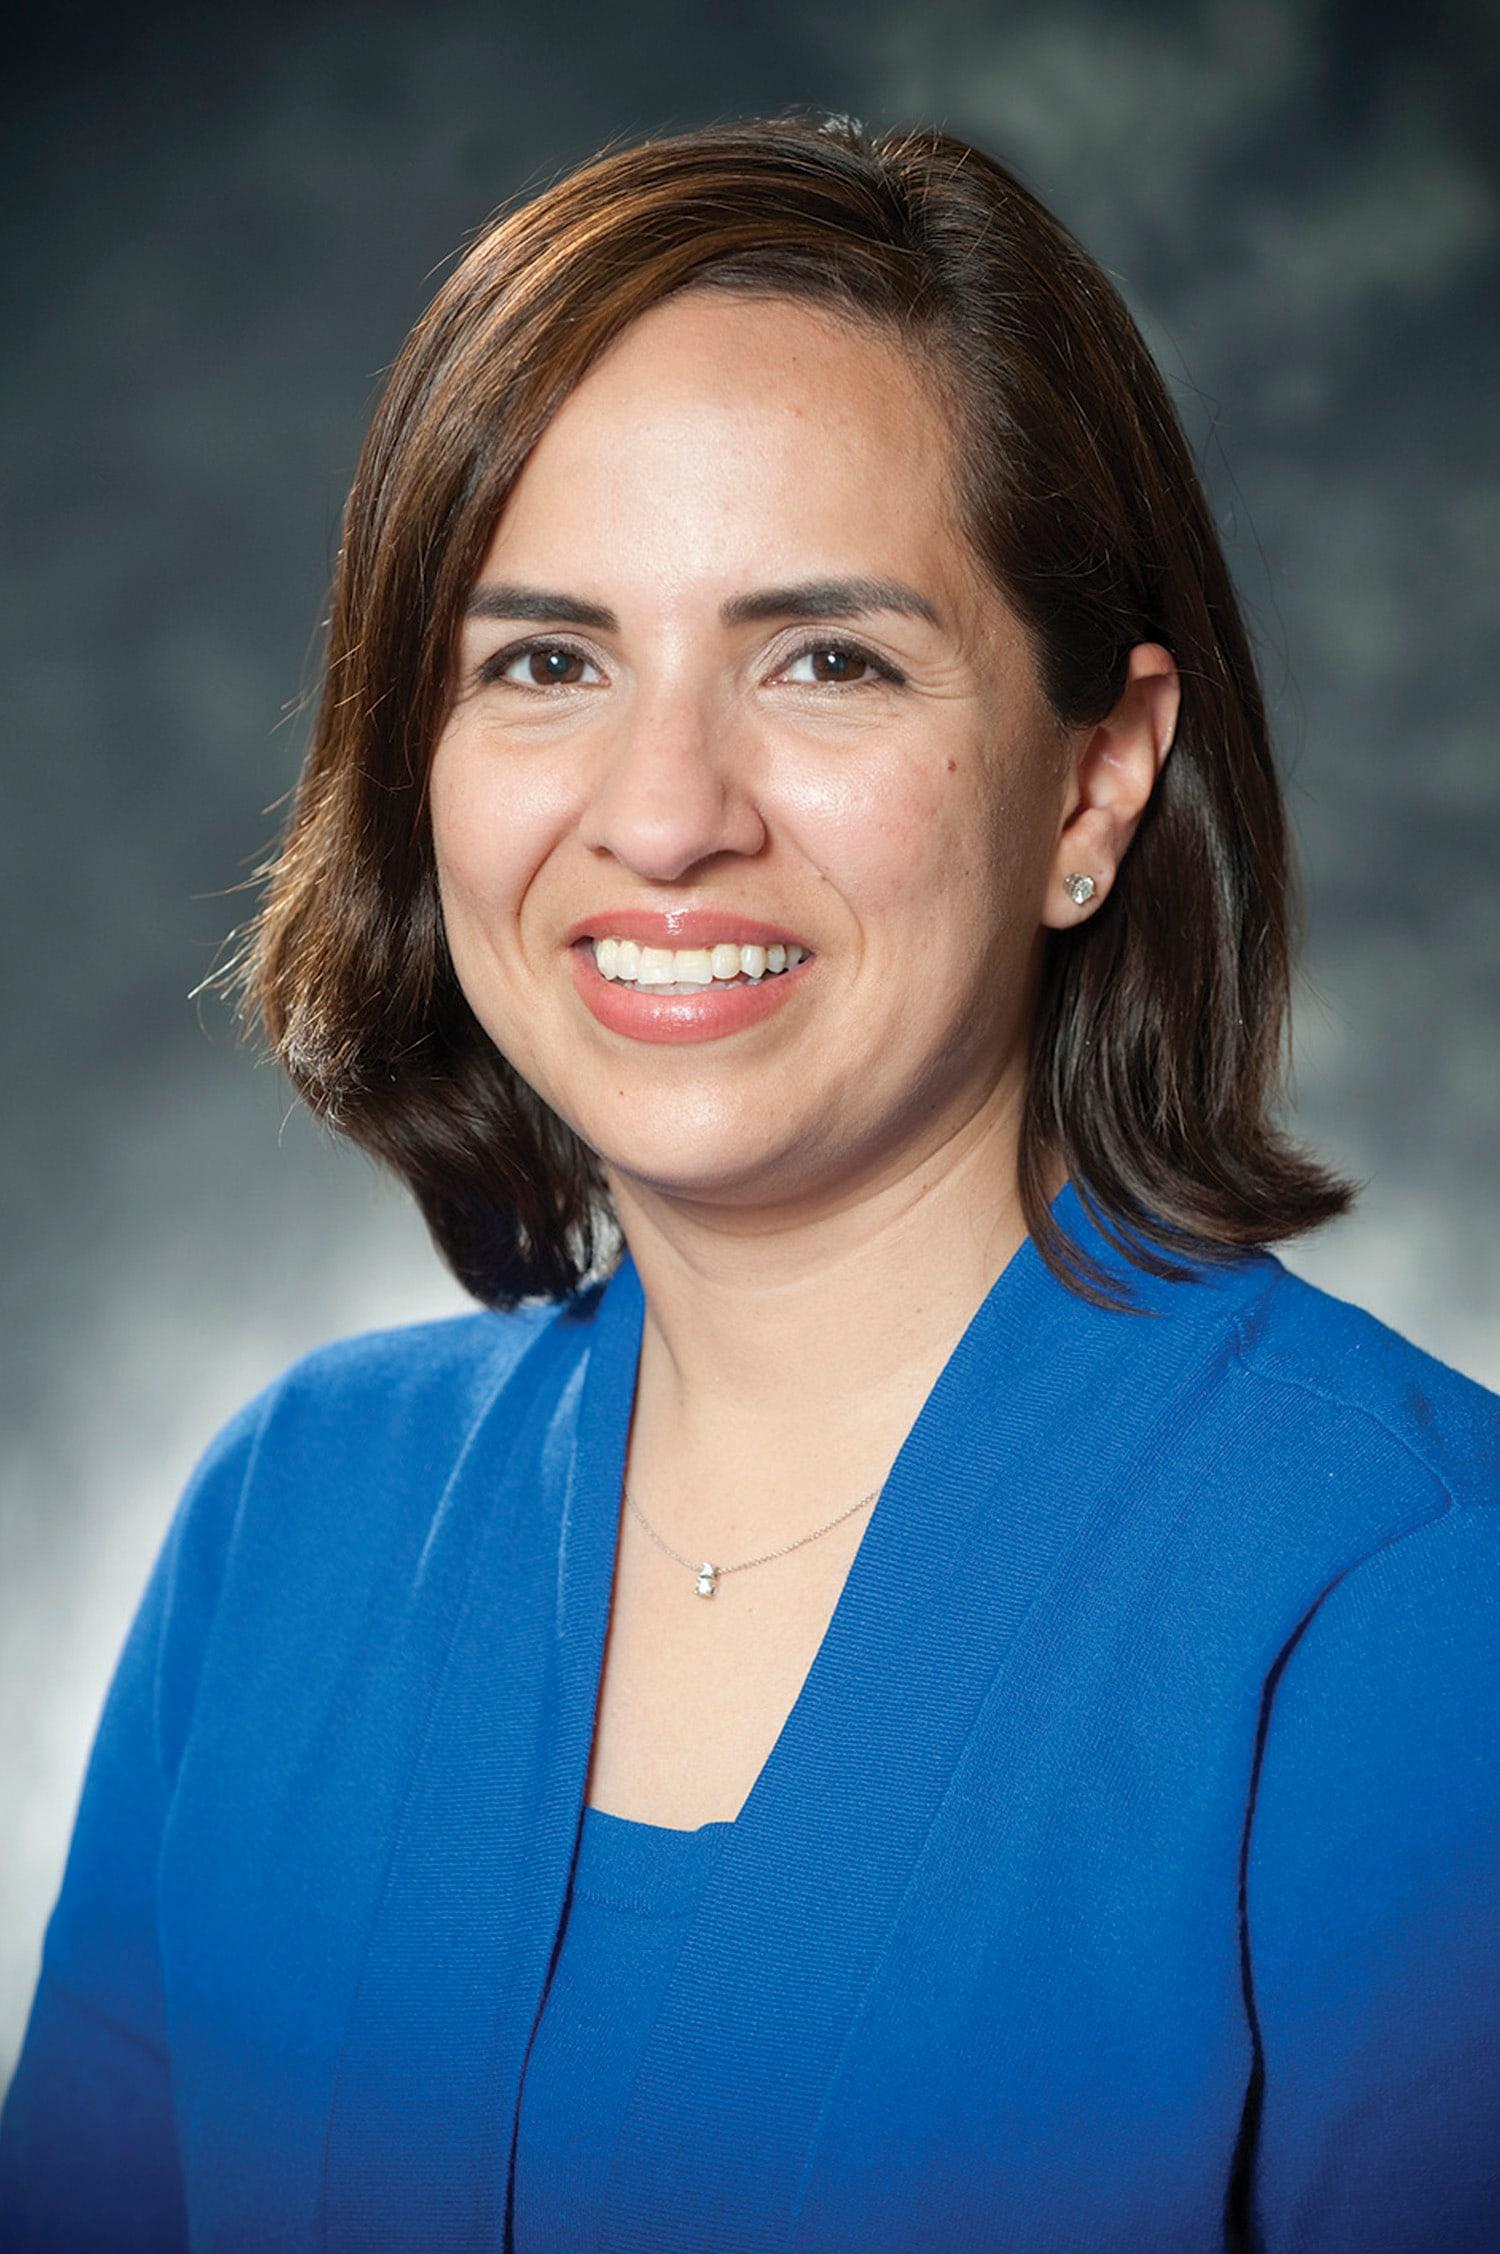 Veronica H Jude, MD Pediatric Hematology-Oncology